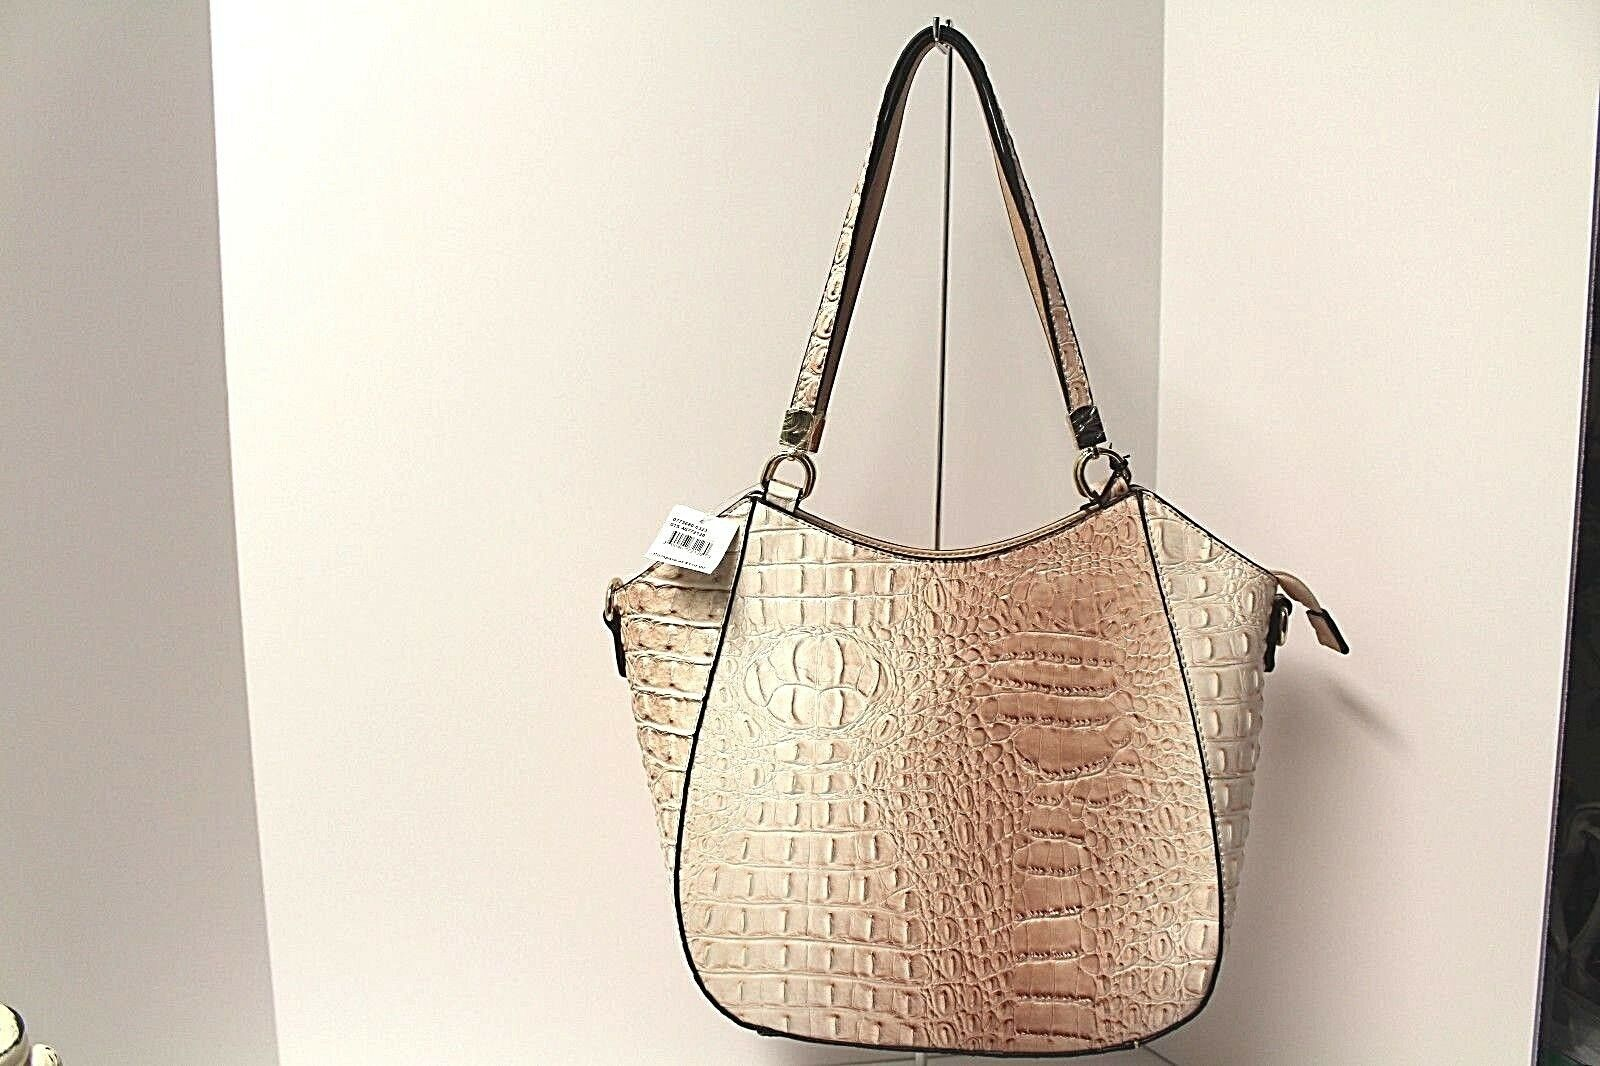 066ab111cf7a La Diva Satchel Cross Body Bag Purse Italian Design Croc-embossed ...